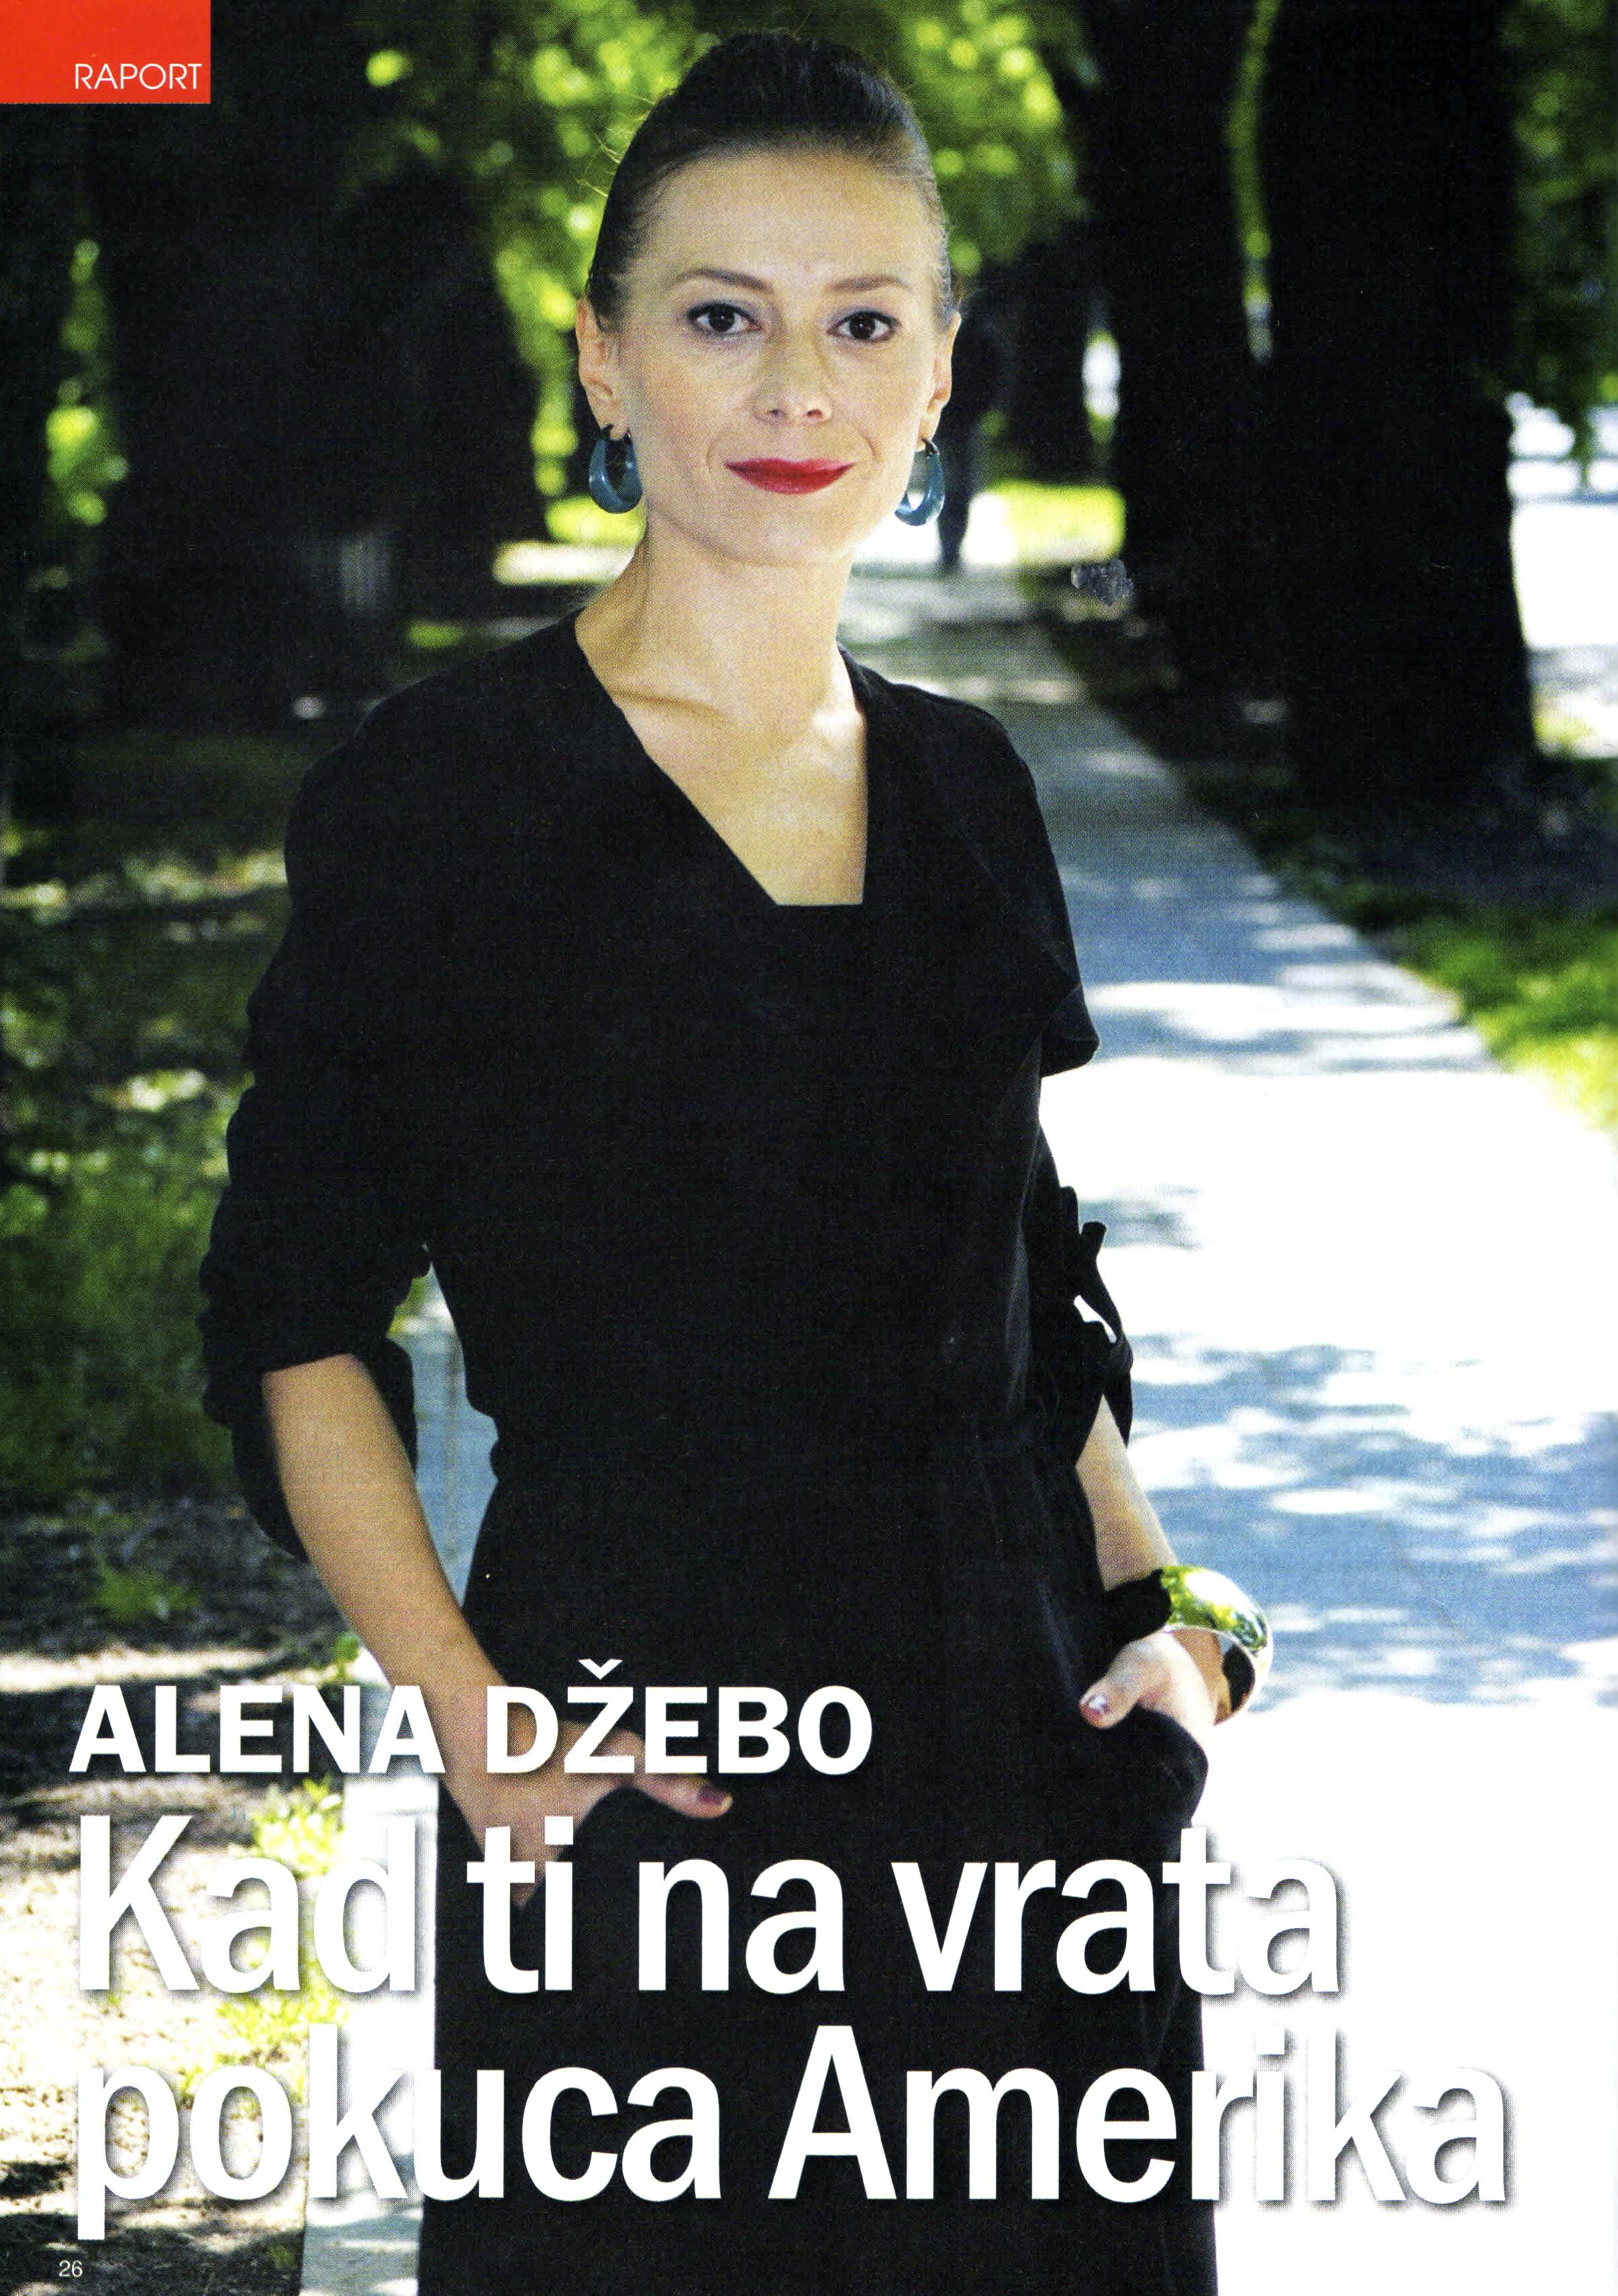 """When America Knocks on Your Door""   By Živana Jovančić, May 23, 2014. Published by Gracija."